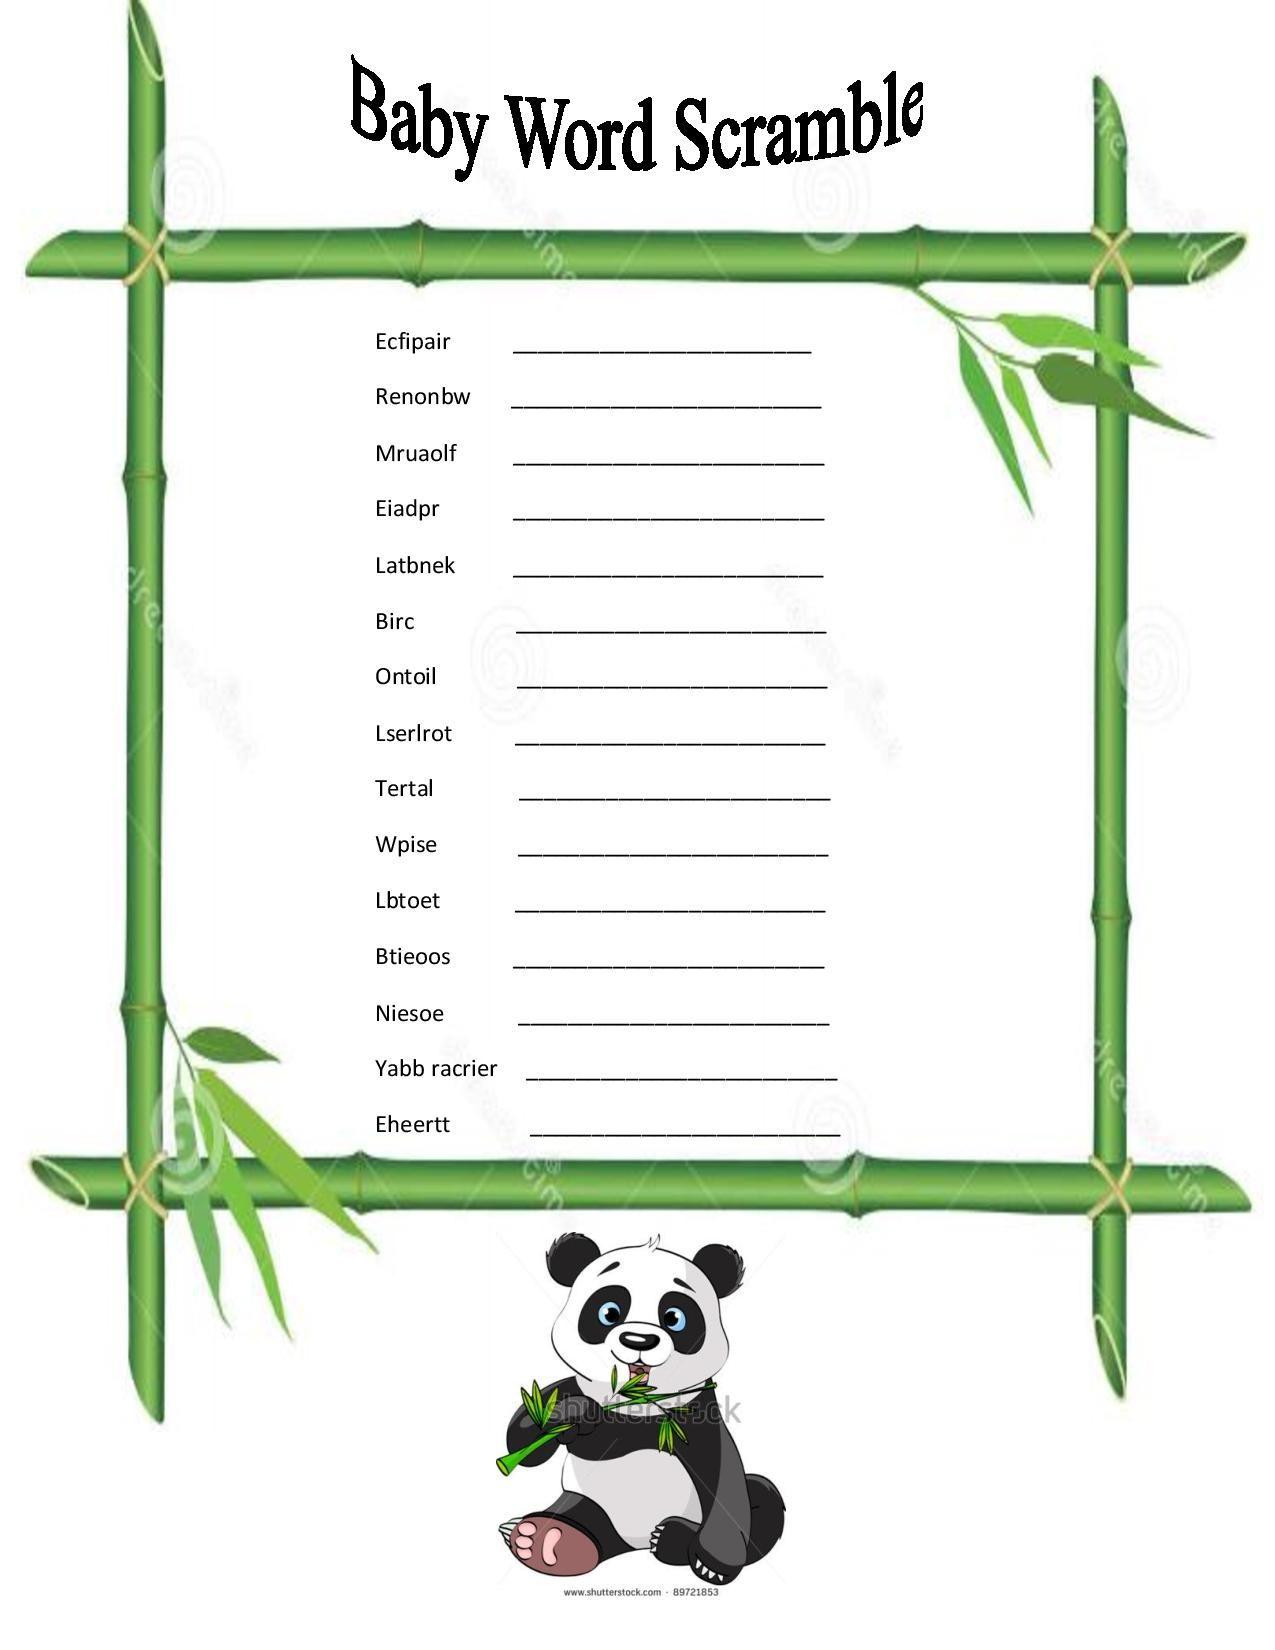 Dyi Panda Themed Baby Word Scramble Game